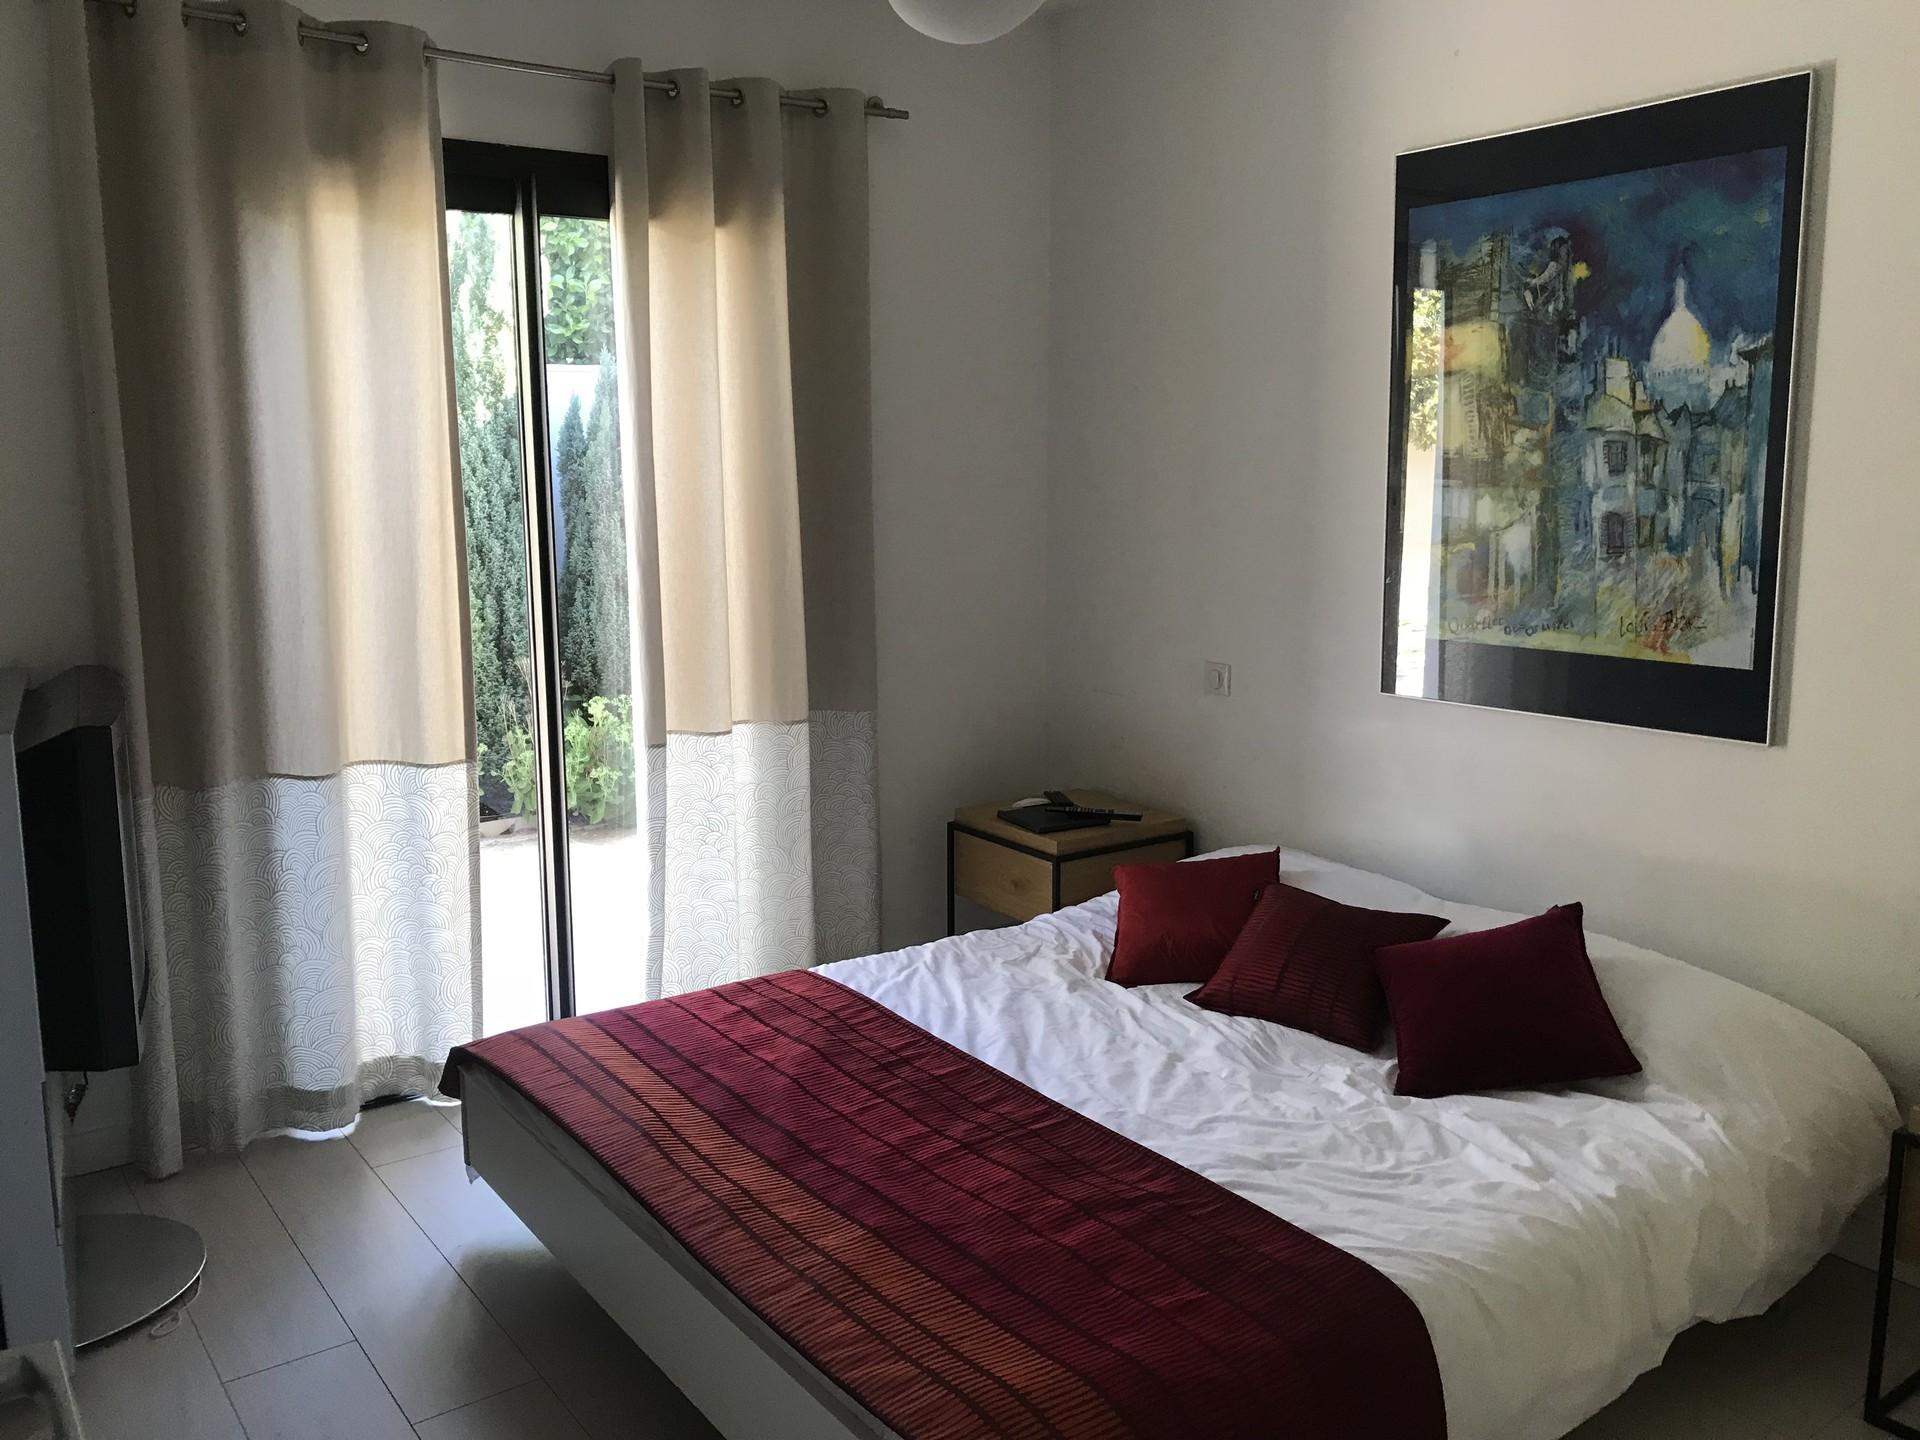 chambre-sdb-villa-de-standing-6673f78d3e1976ed2d2c0397f5d24967